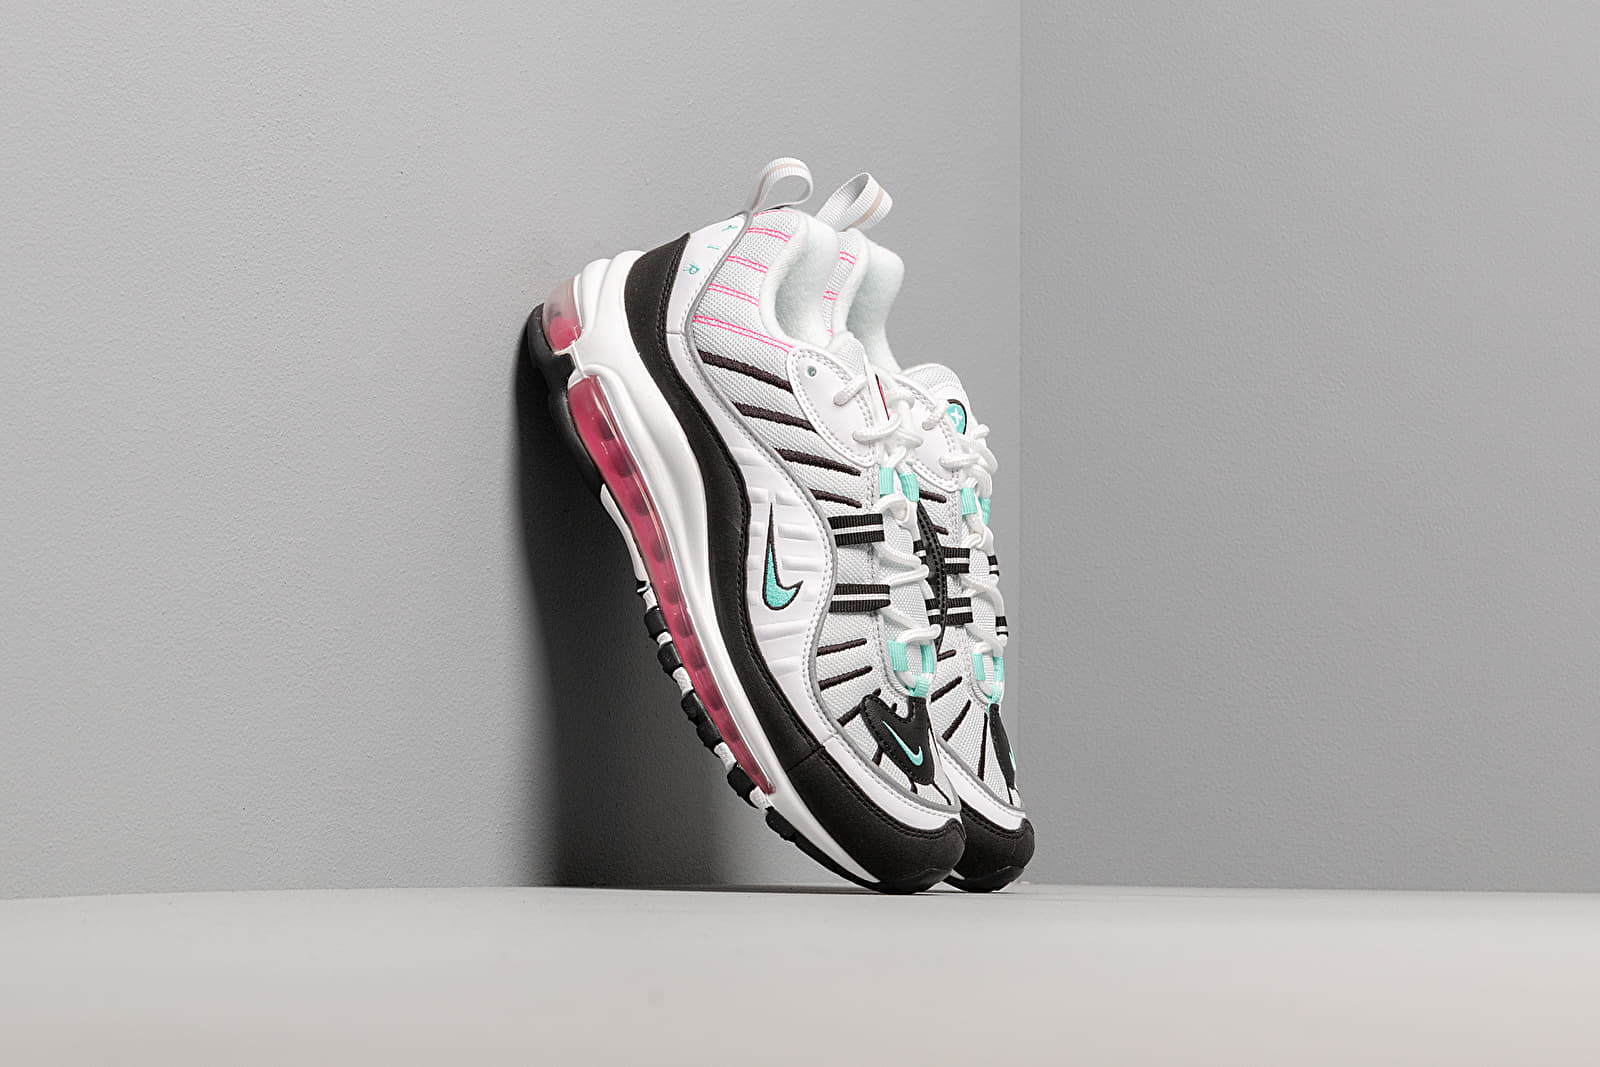 Dámske topánky a tenisky Nike W Air Max 98 Pure Platinum/ Aurora Green-Black